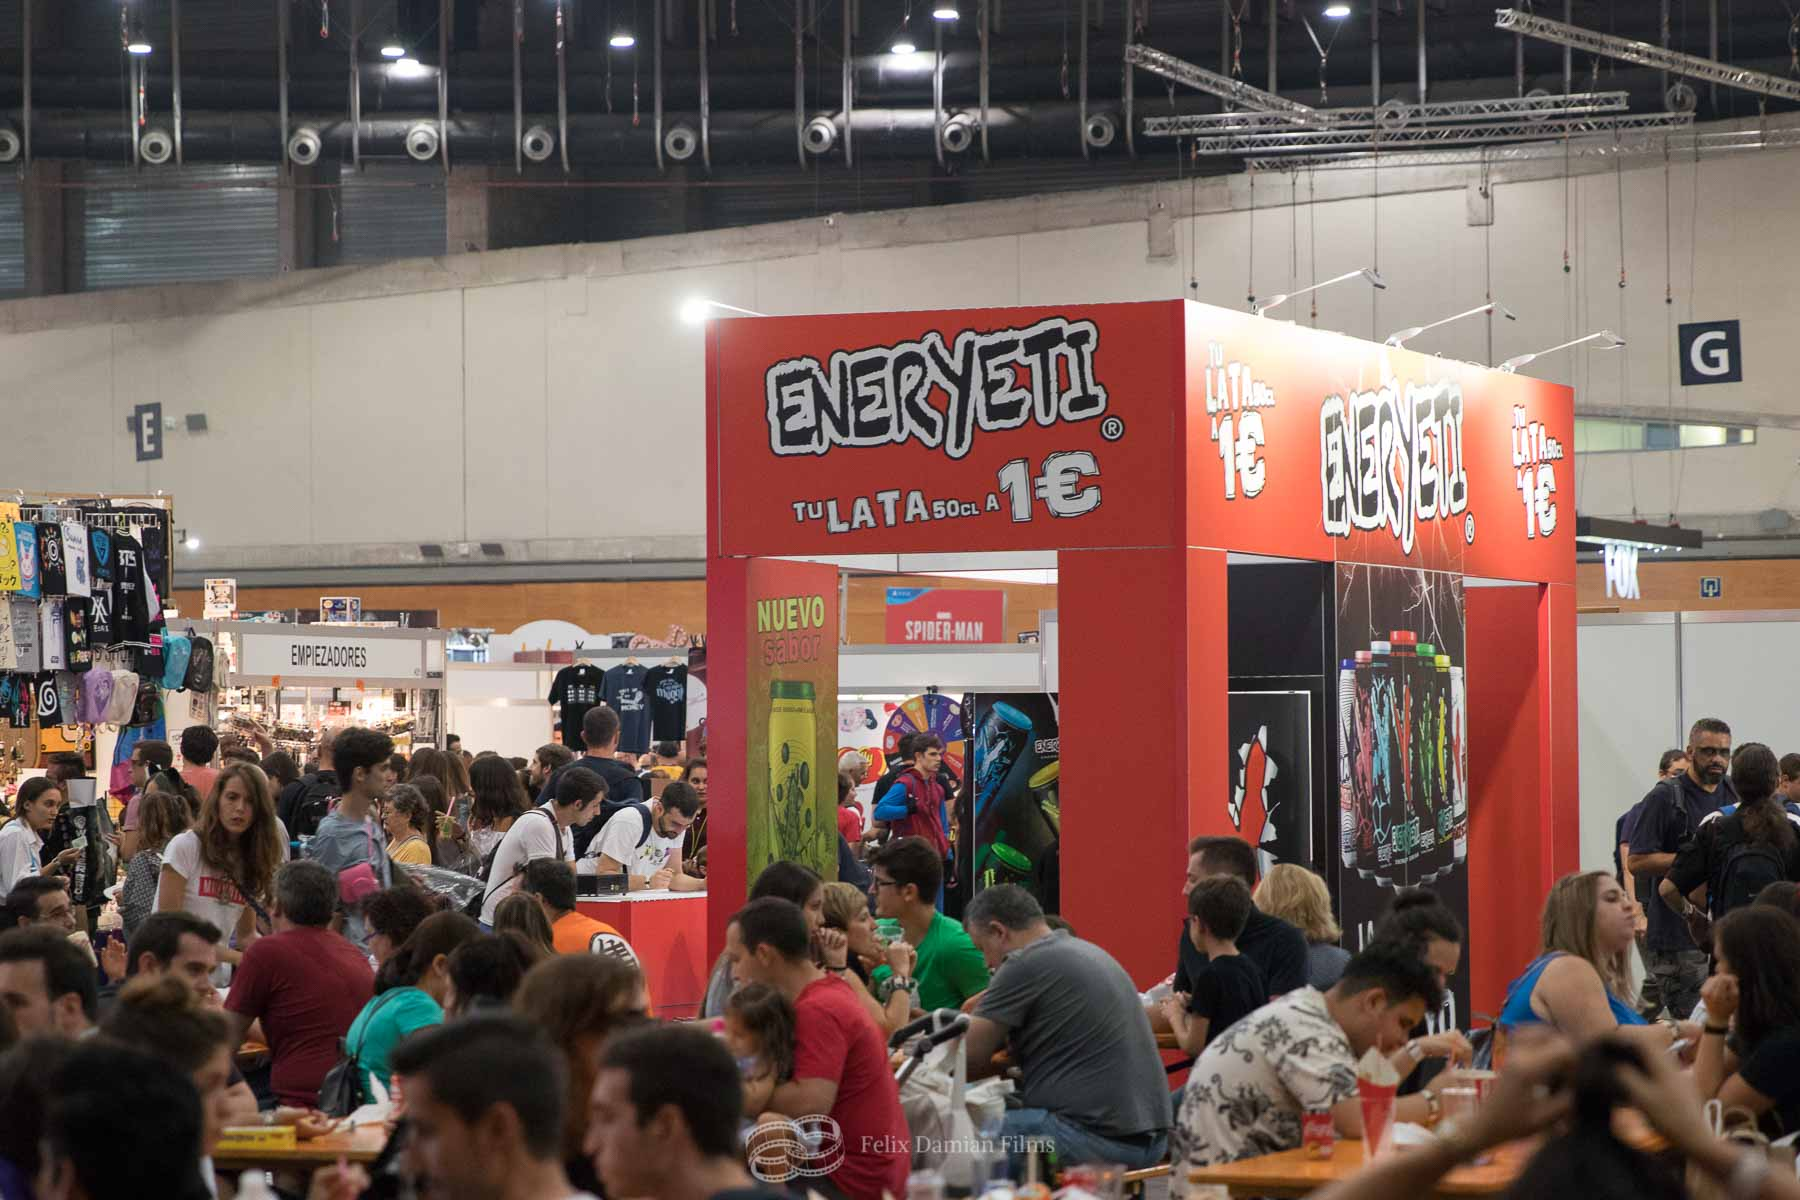 eventos eneryeti ifema-4